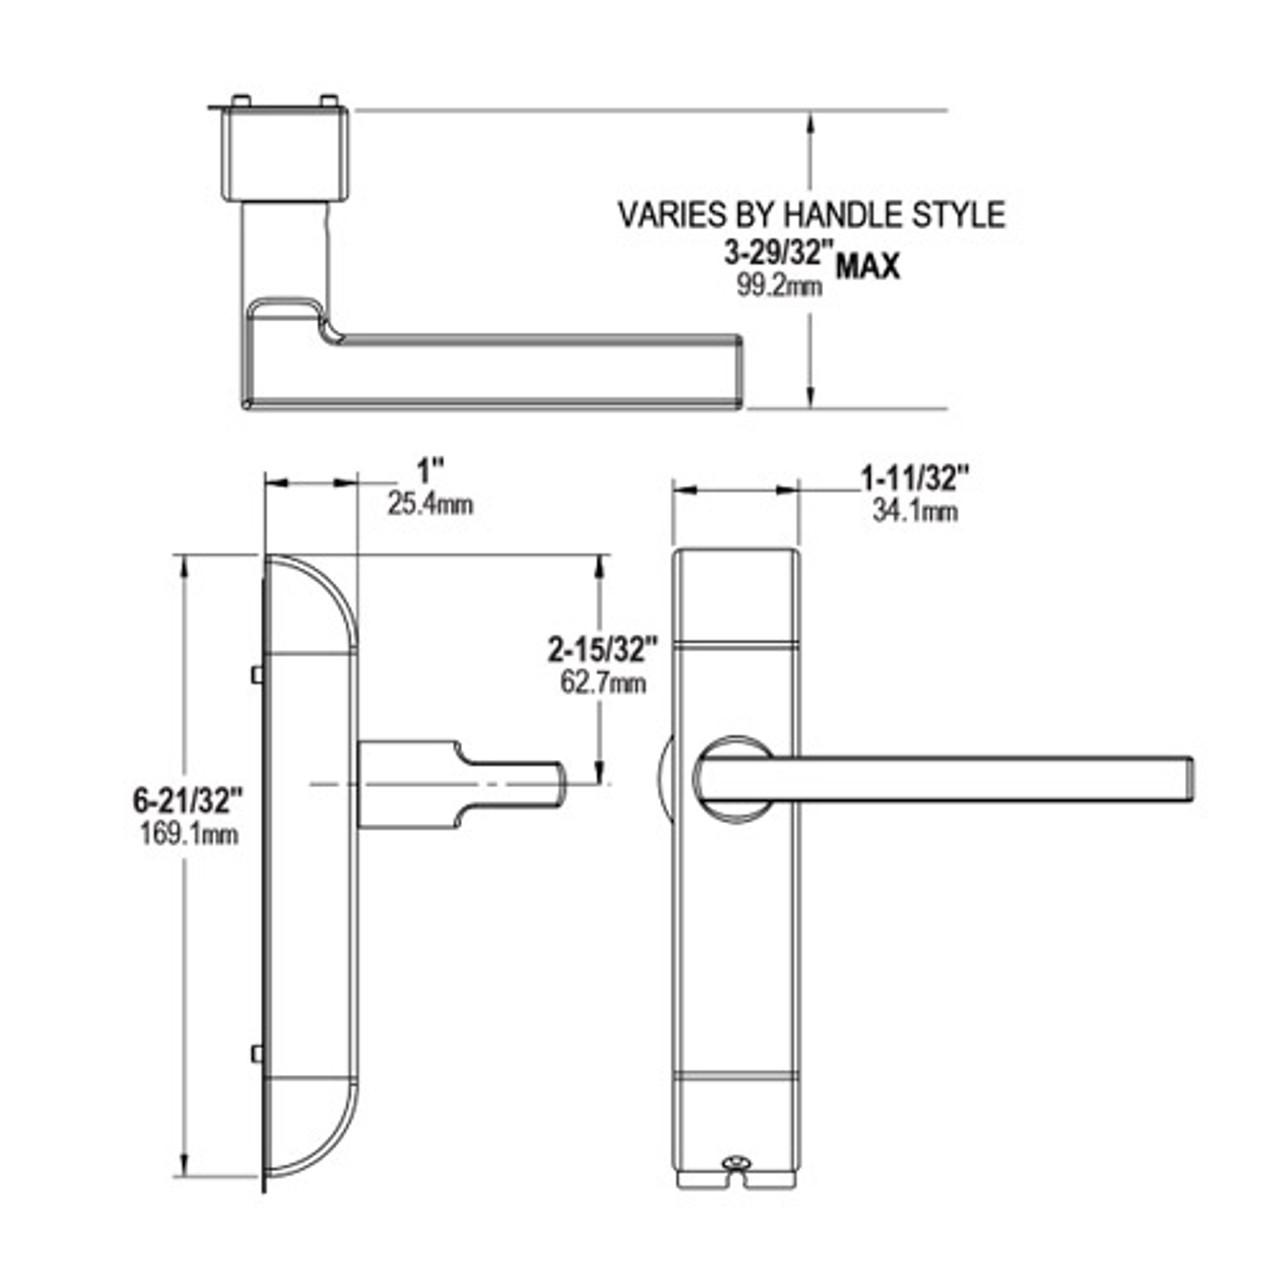 4600M-MV-632-US10B Adams Rite MV Designer handle Dimensional View